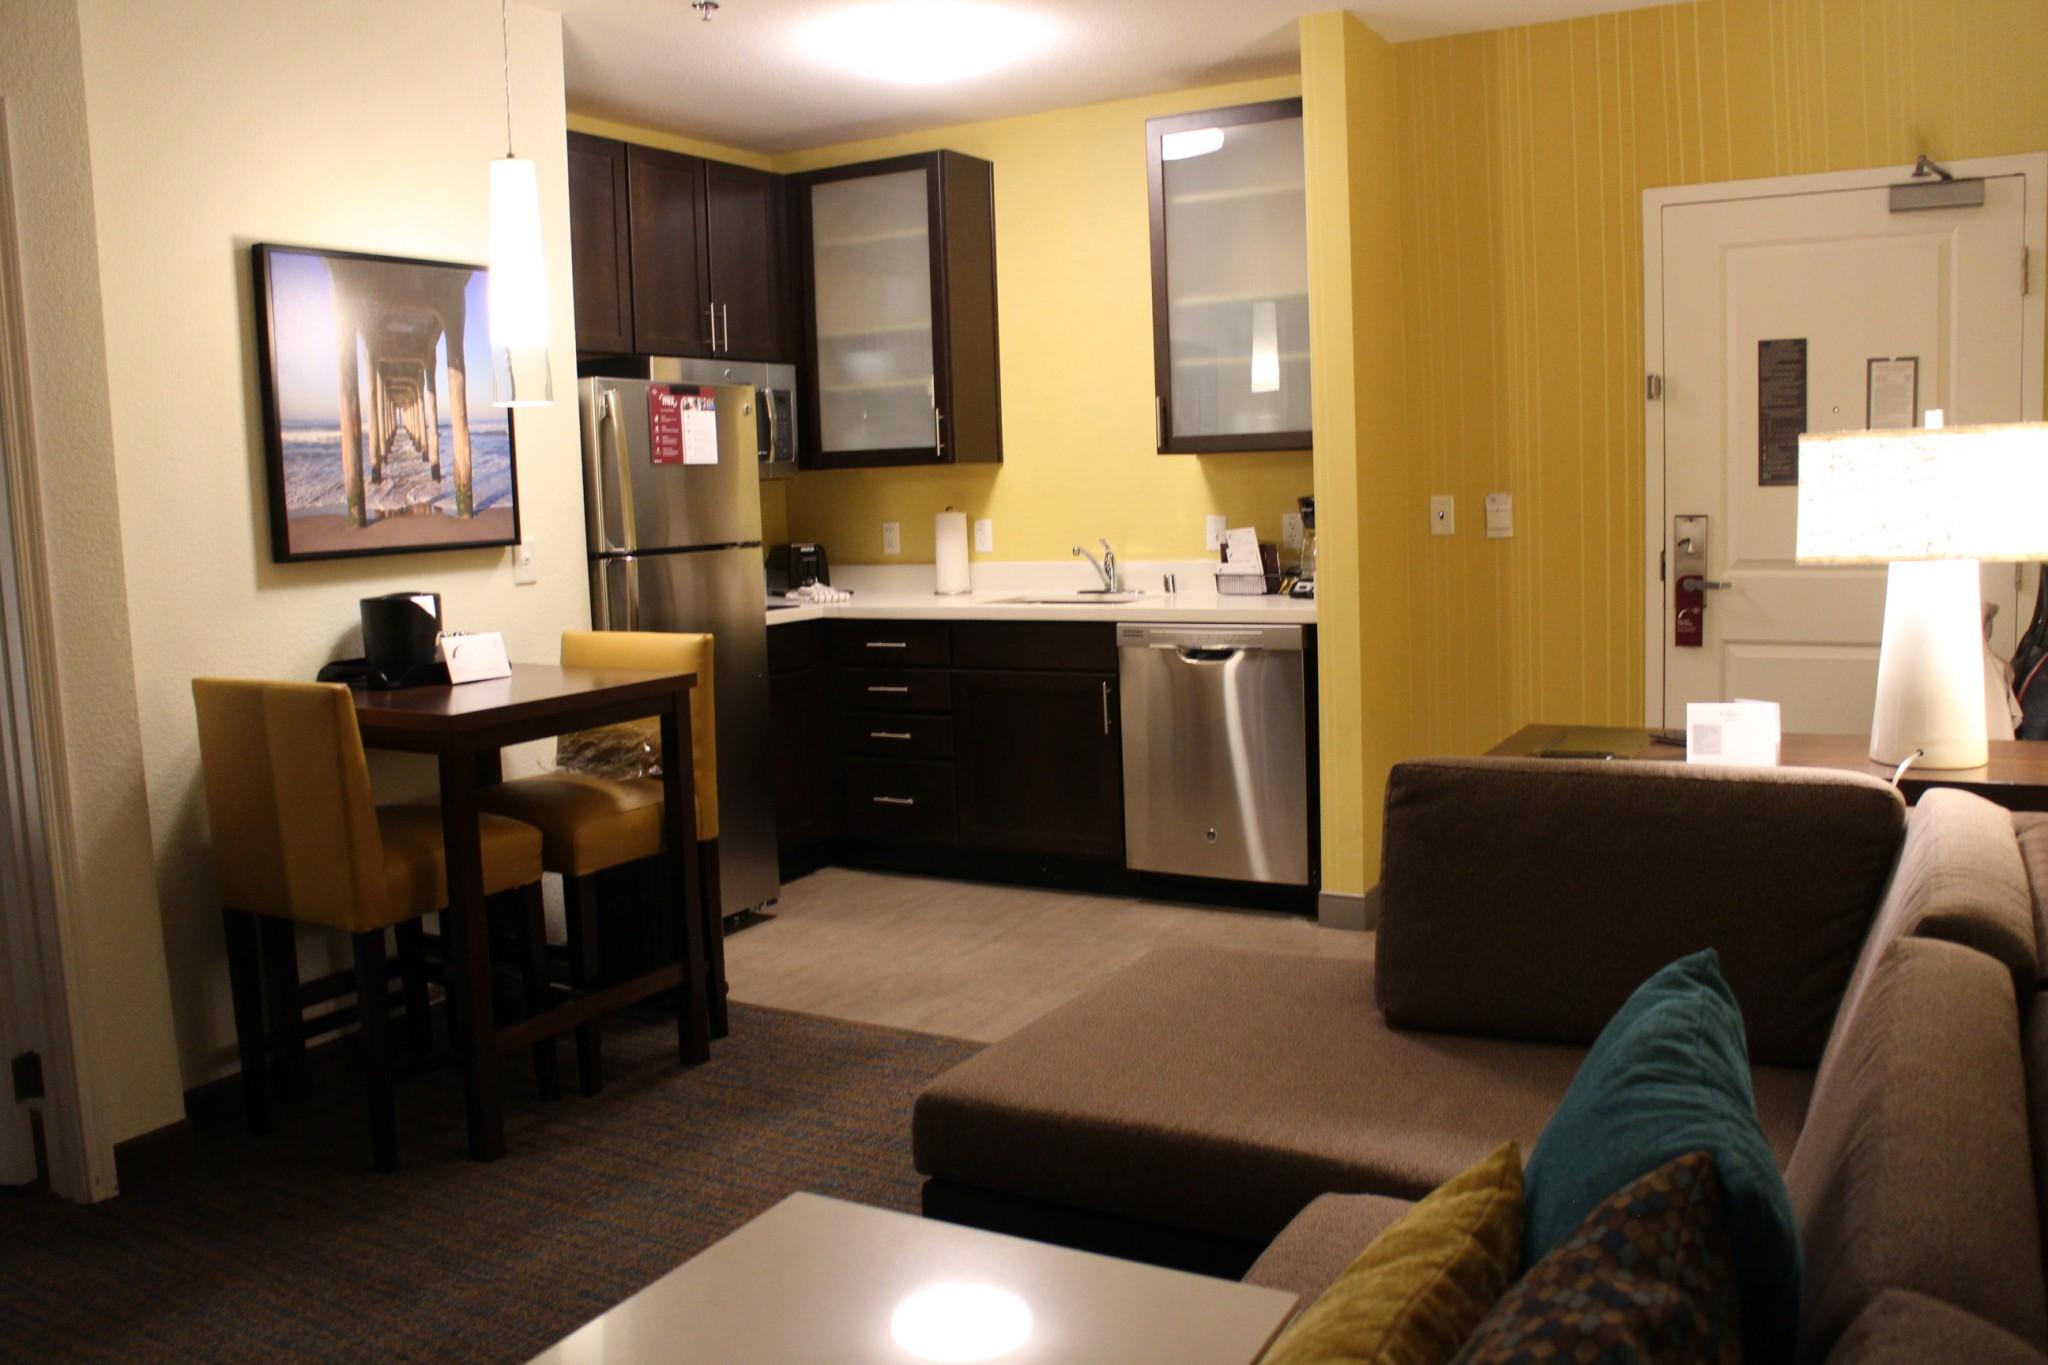 Residence Inn Redondo Beach kitchen